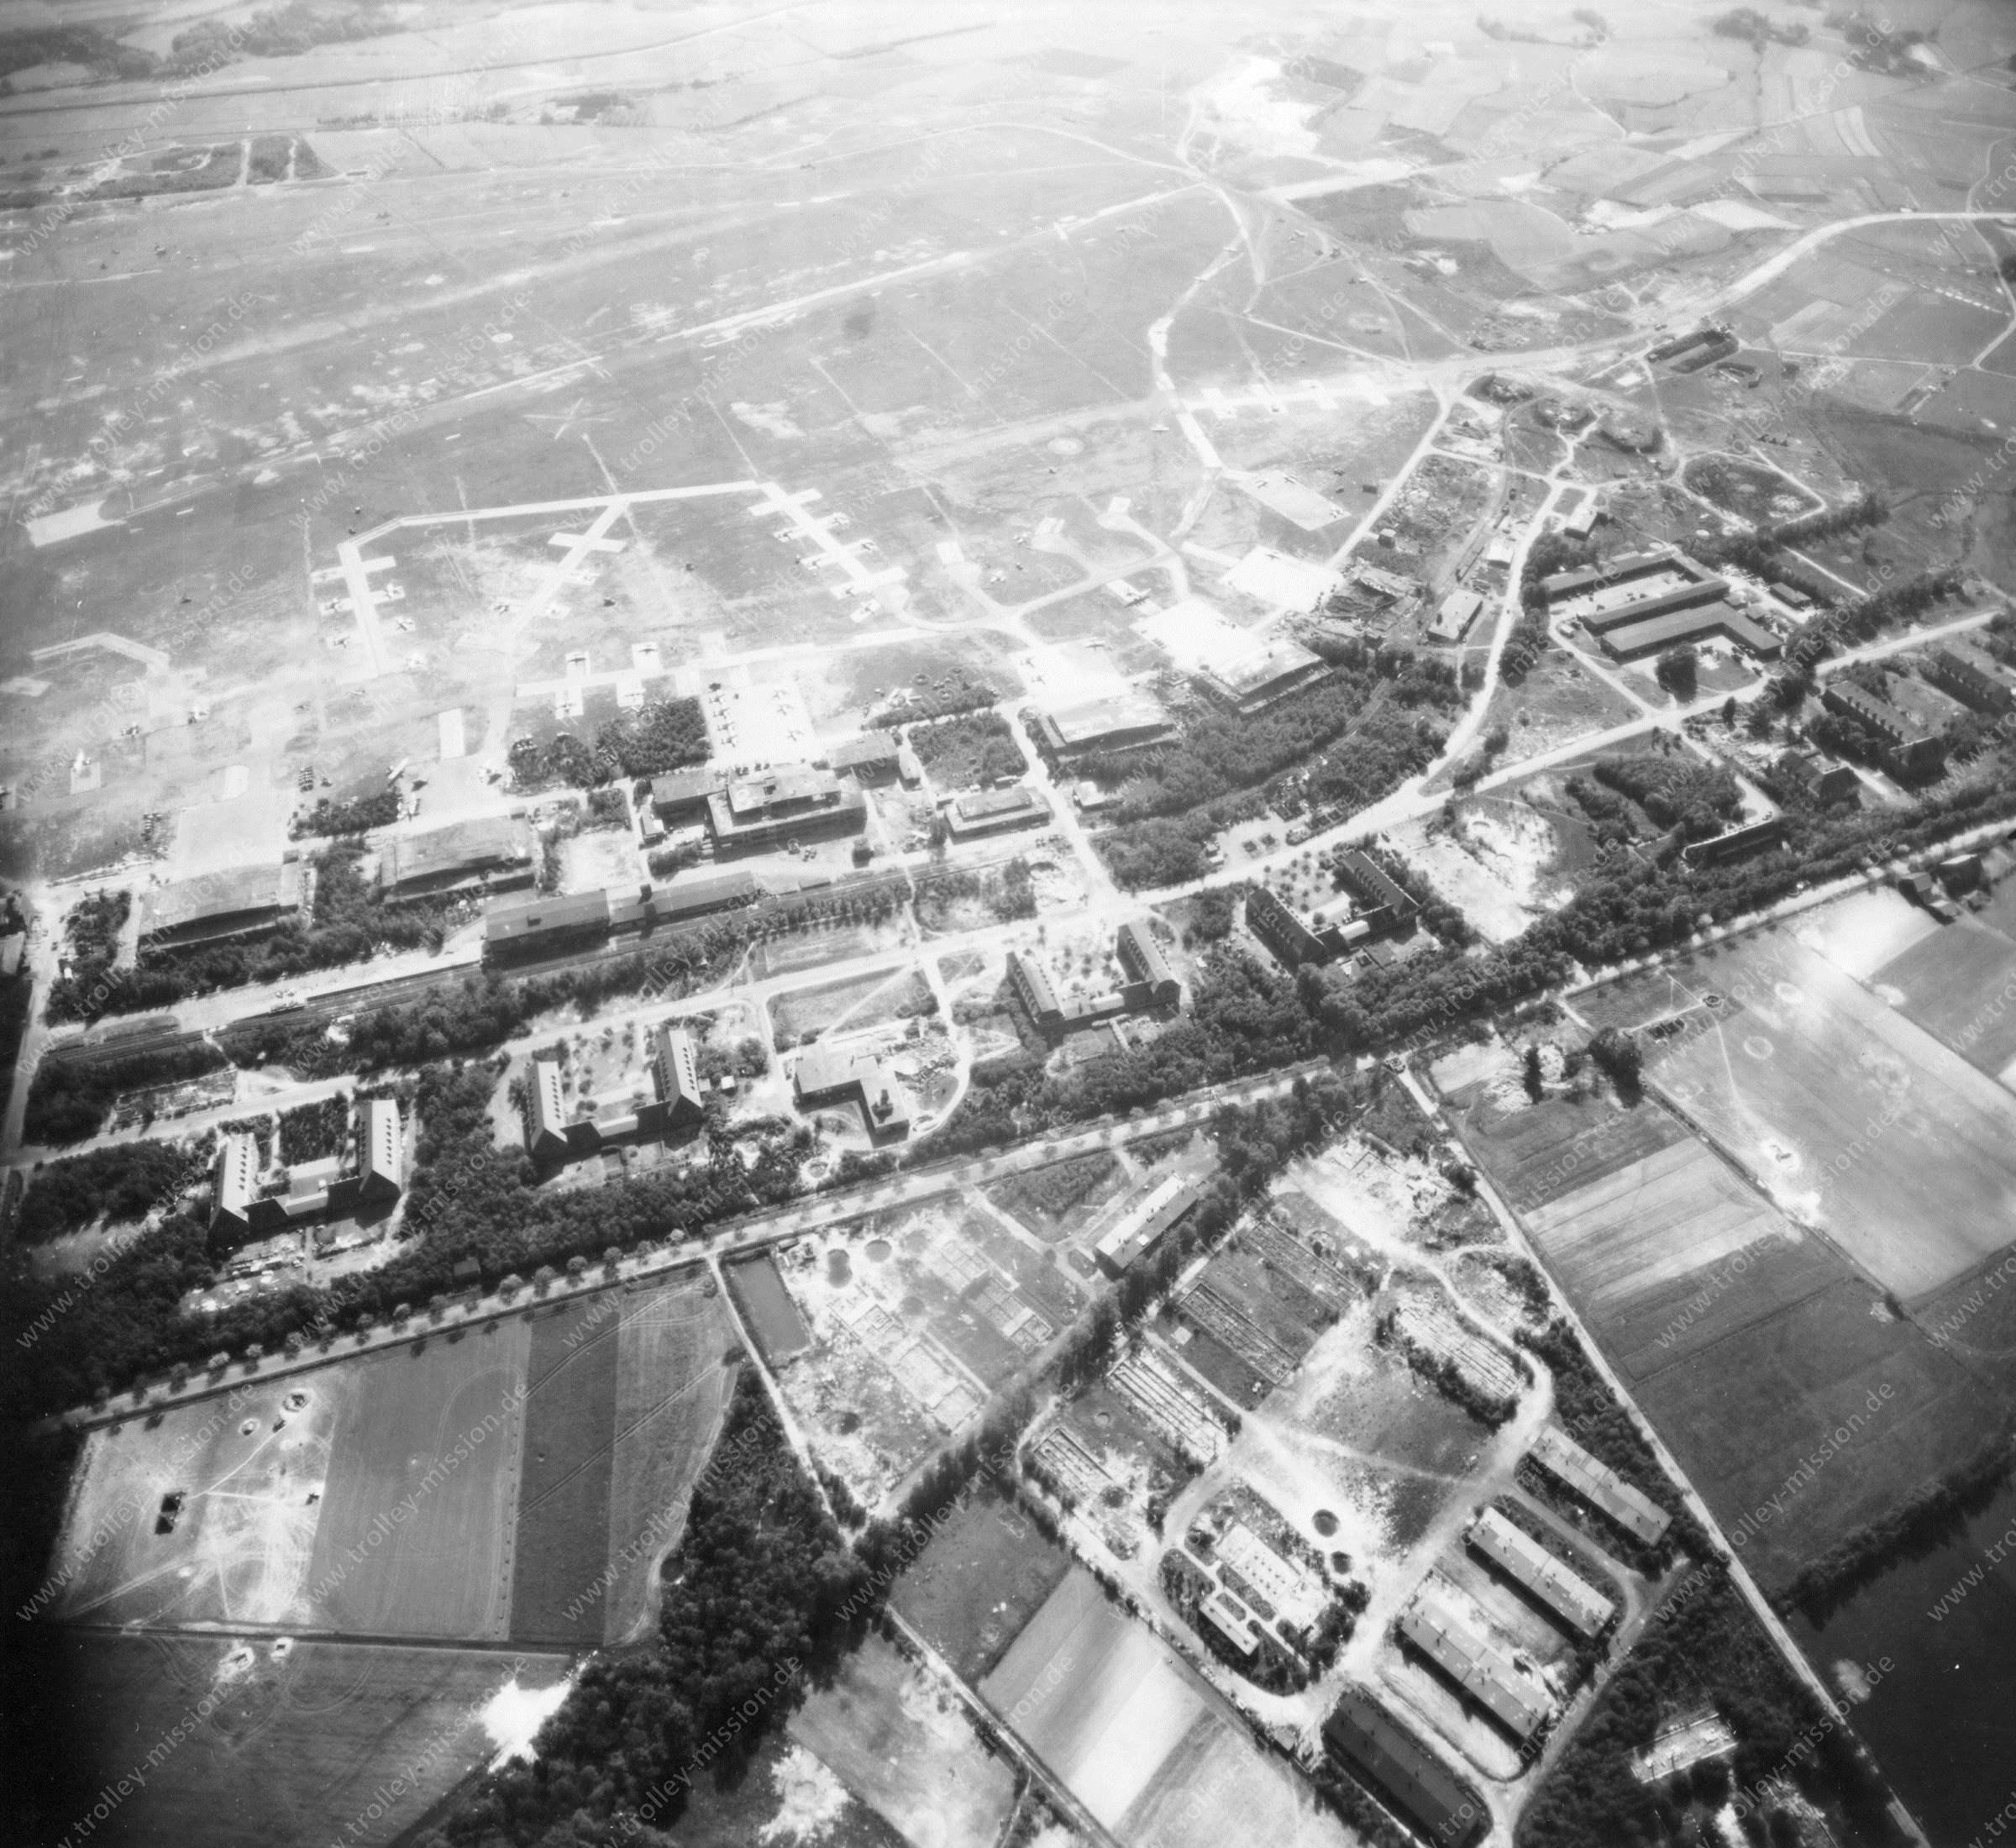 Luftbild Fliegerhorst Gütersloh der Luftwaffe